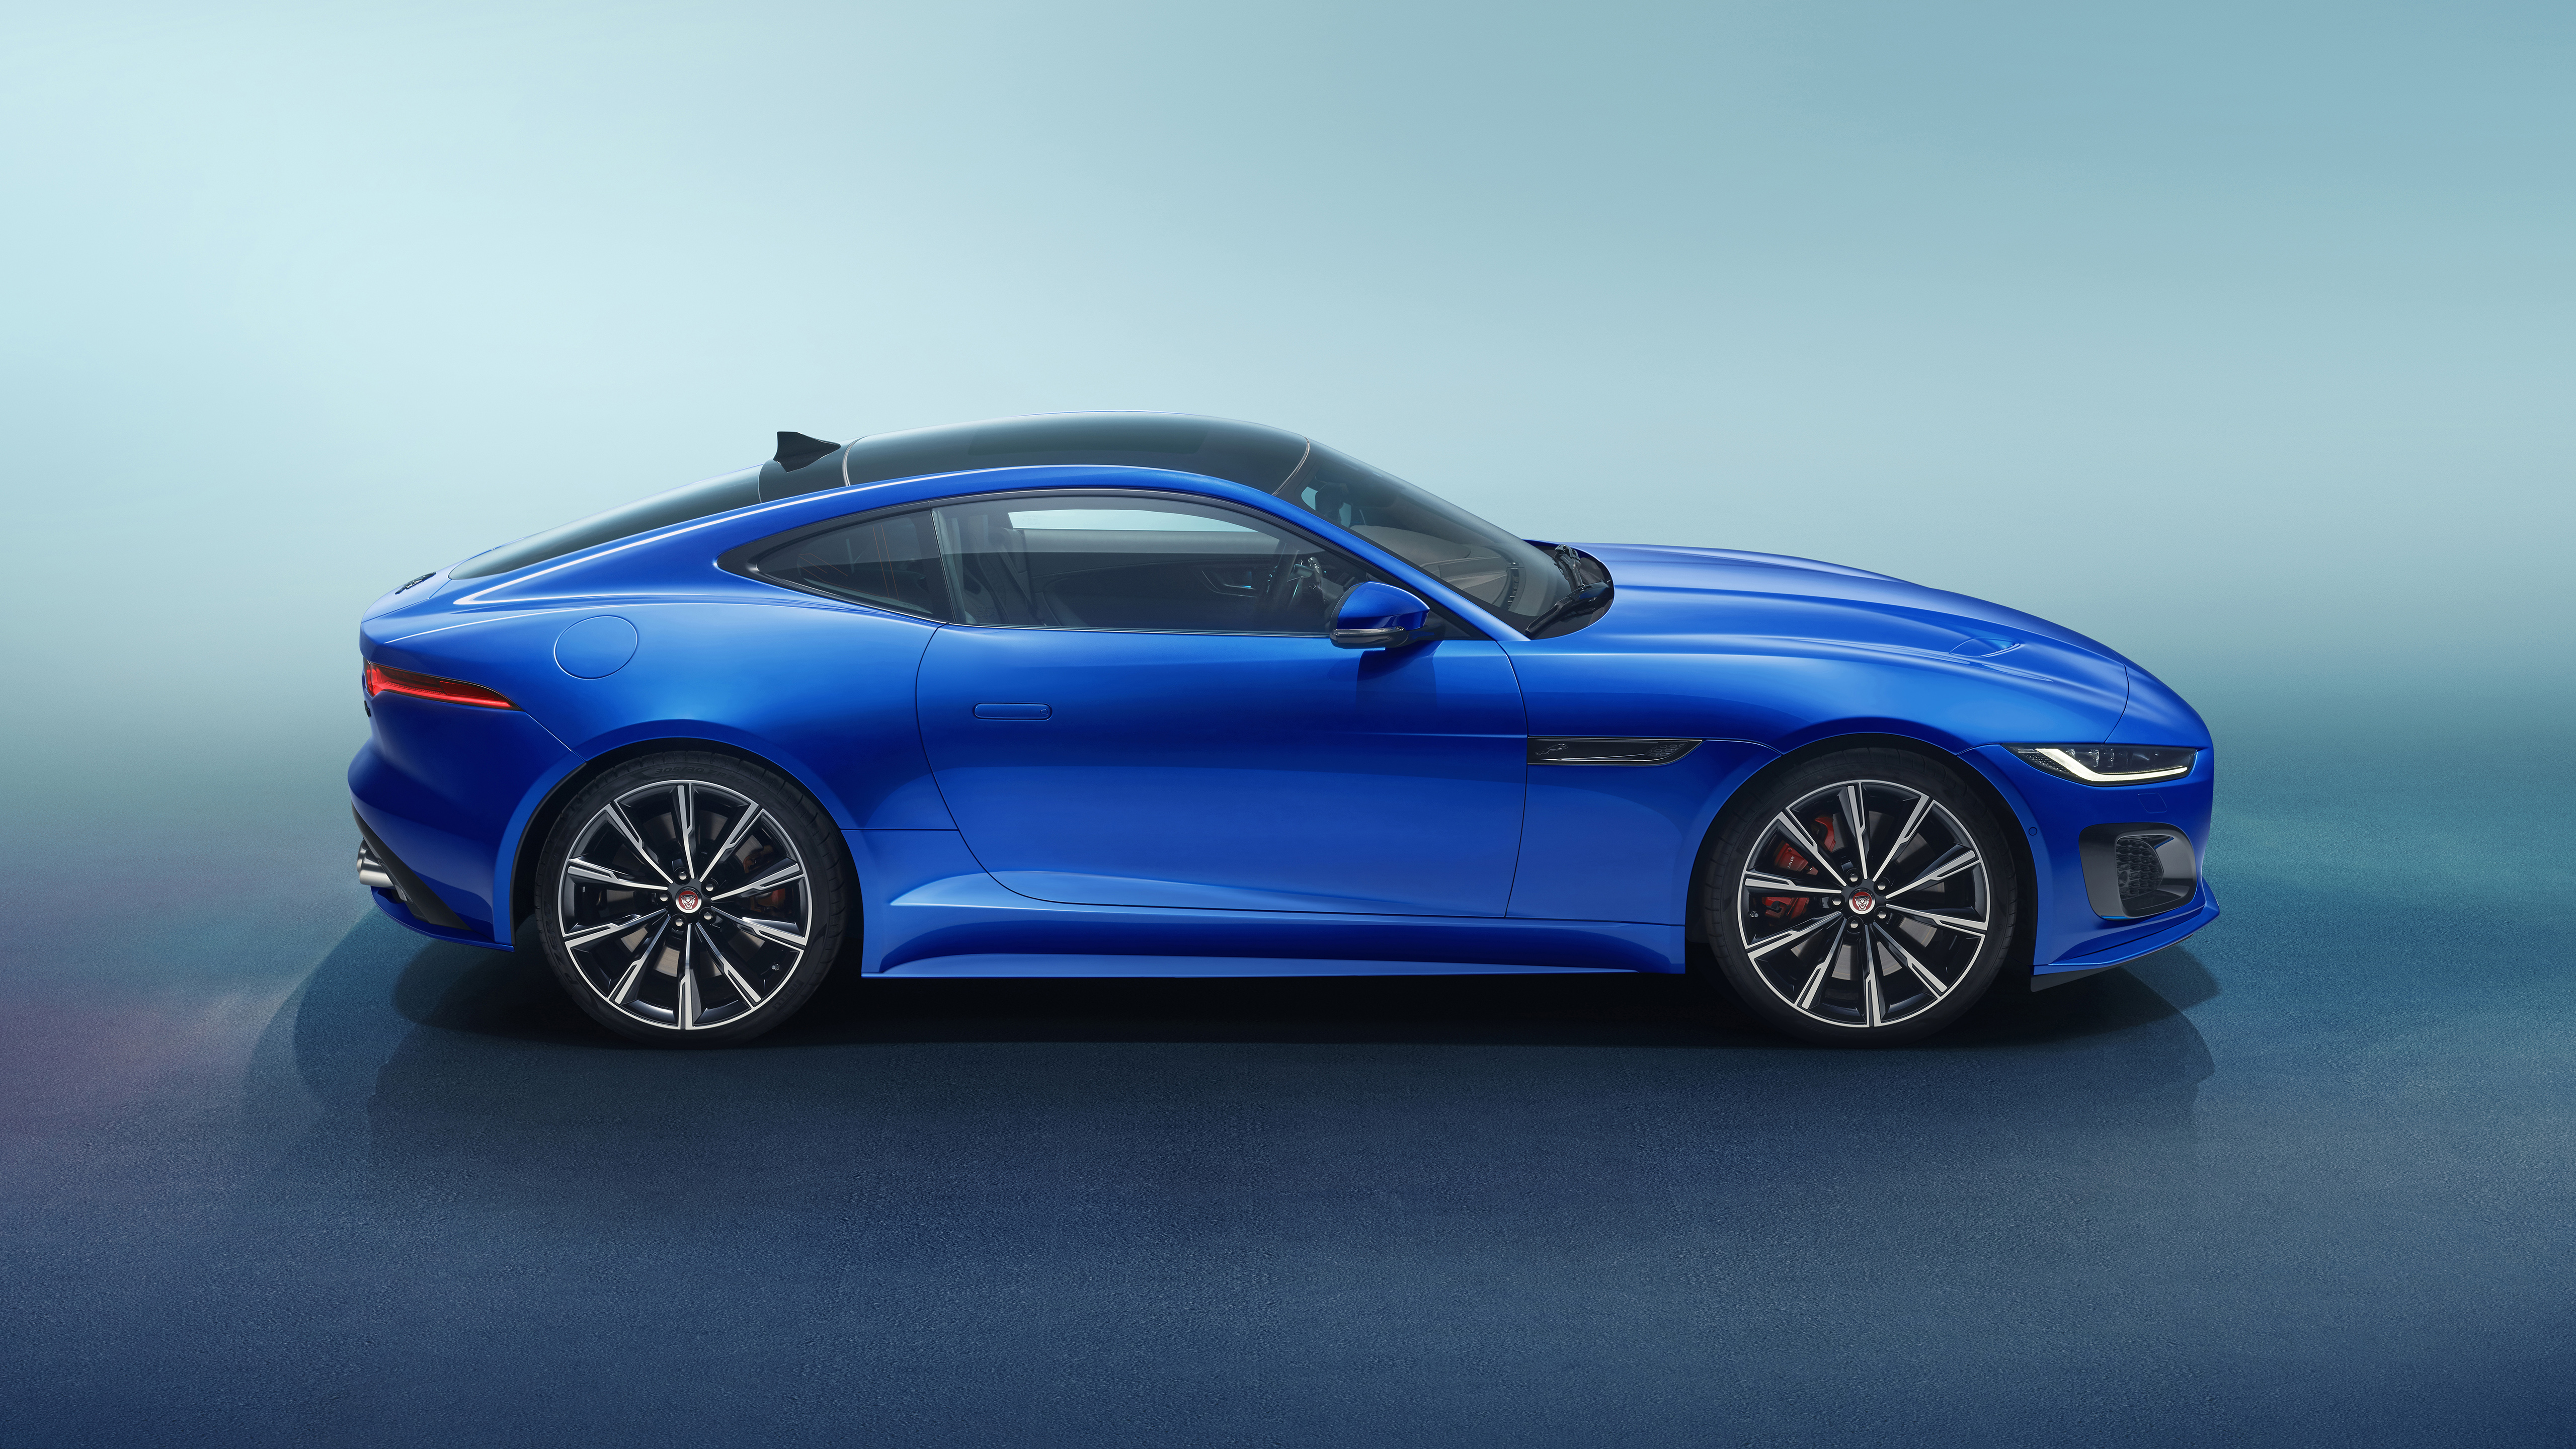 Jaguar F-Type R Coupe 2020 4K 6 Wallpaper | HD Car ...